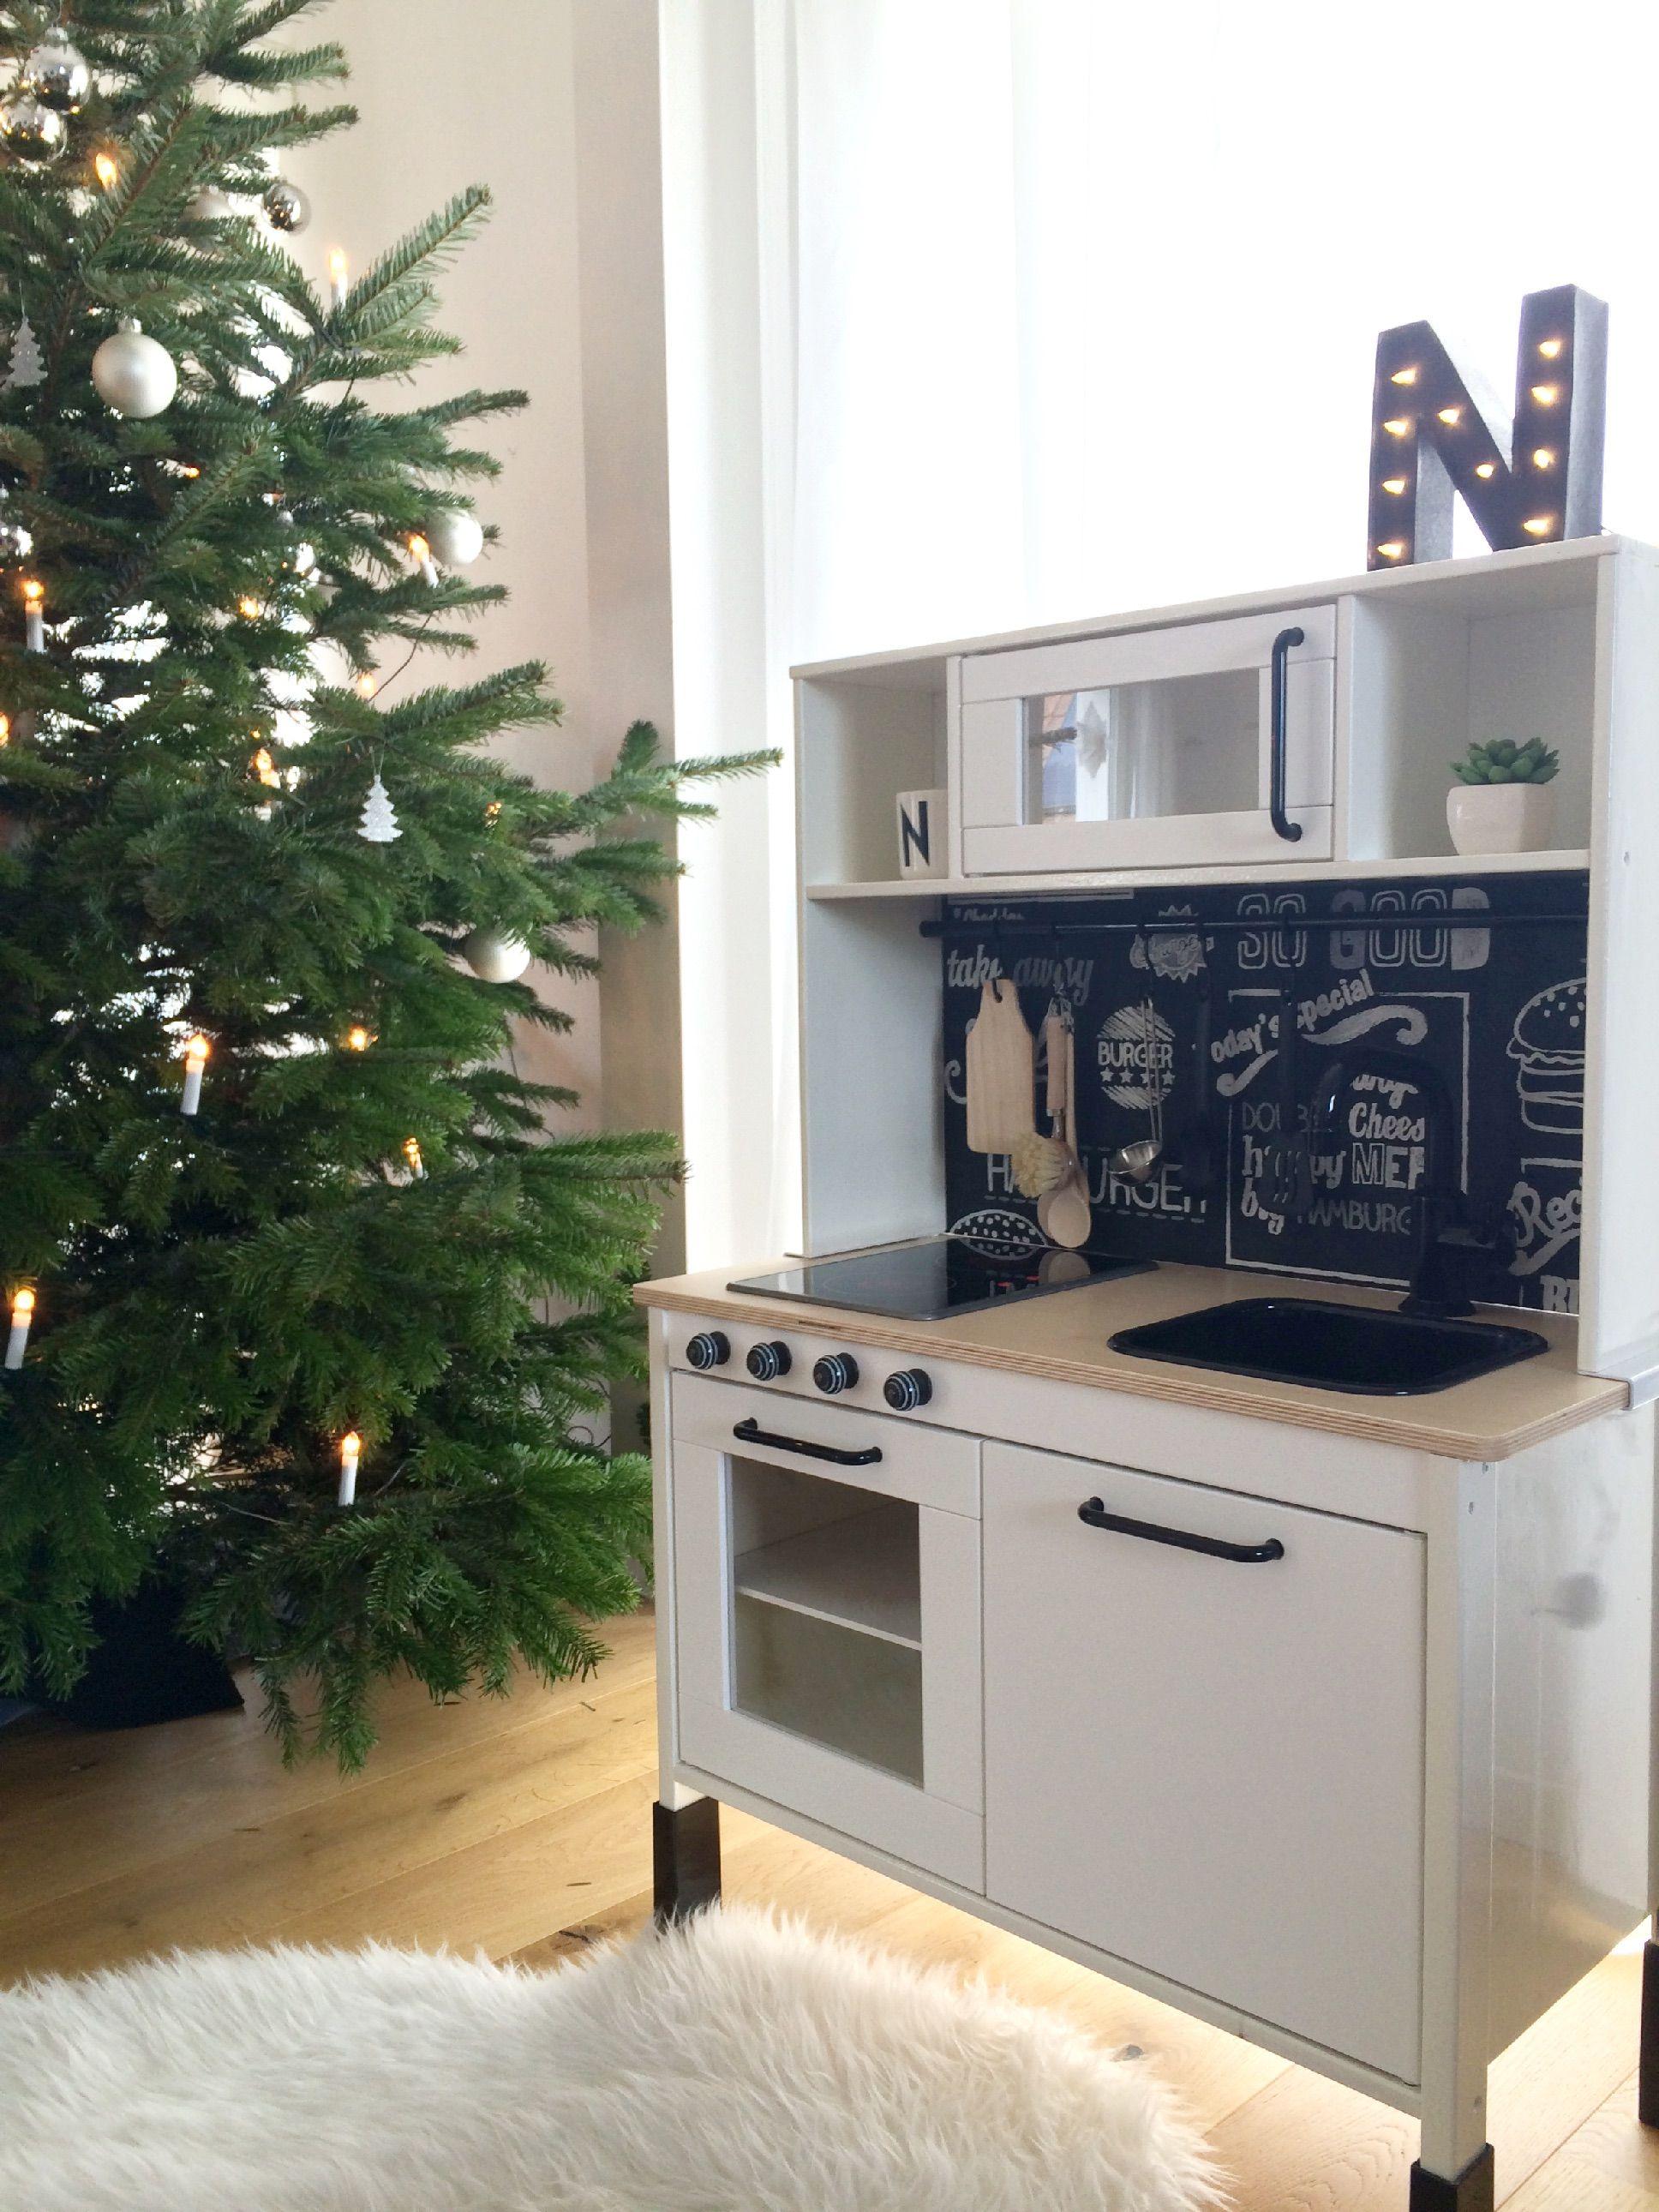 Den duktig hack bringt 39 s christkind in 2019 playroom cuisine ikea cuisinette ikea ikea enfants - Cuisinette ikea ...